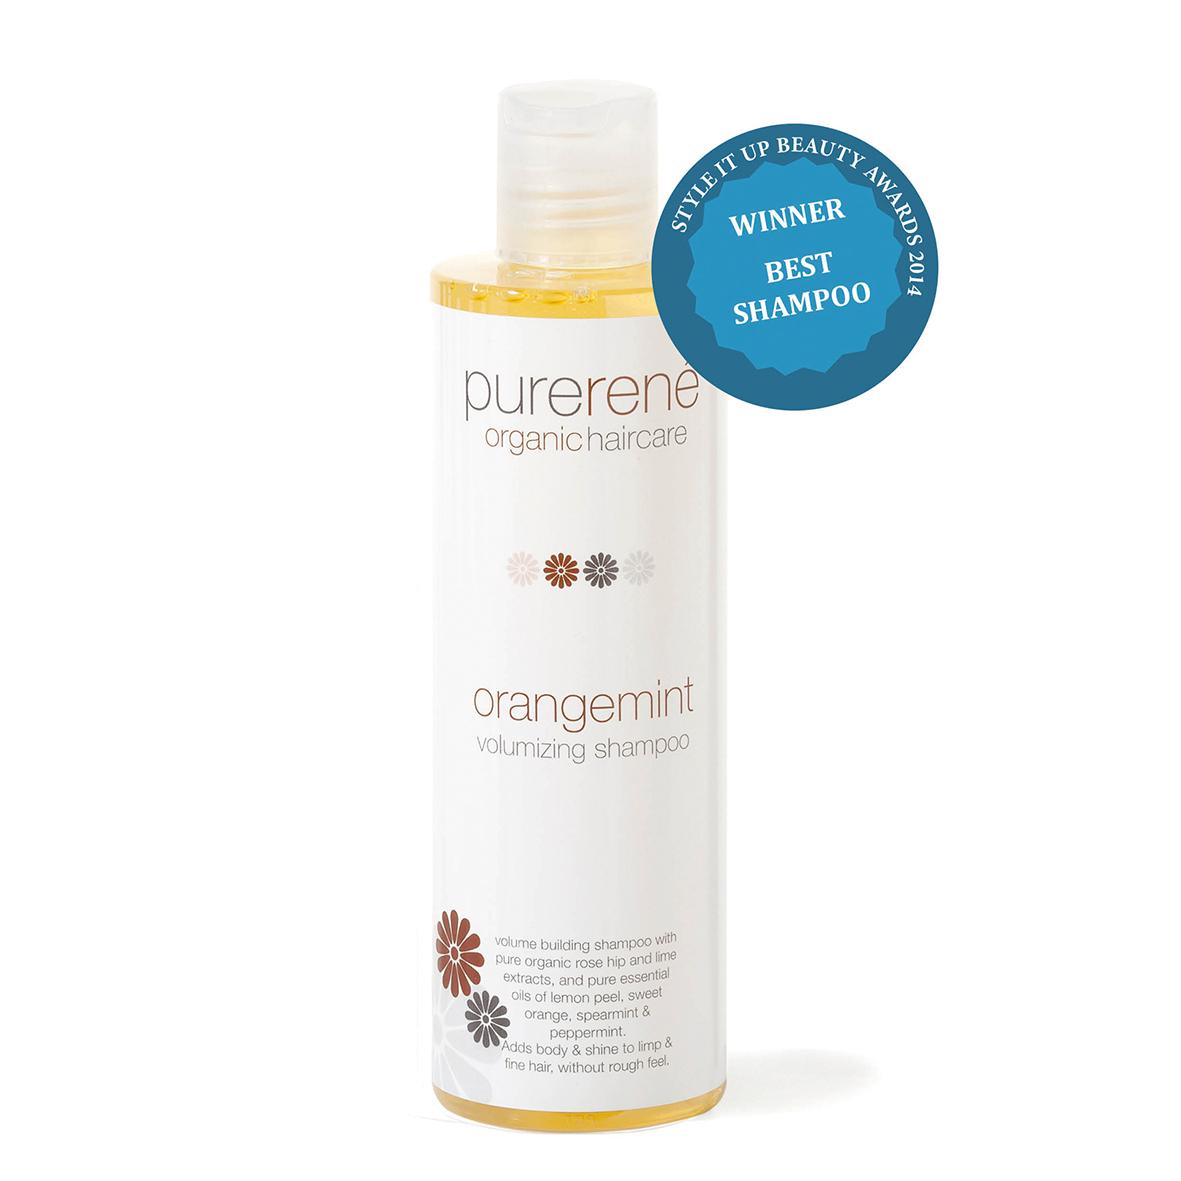 PureRene Orangemint Shampoo